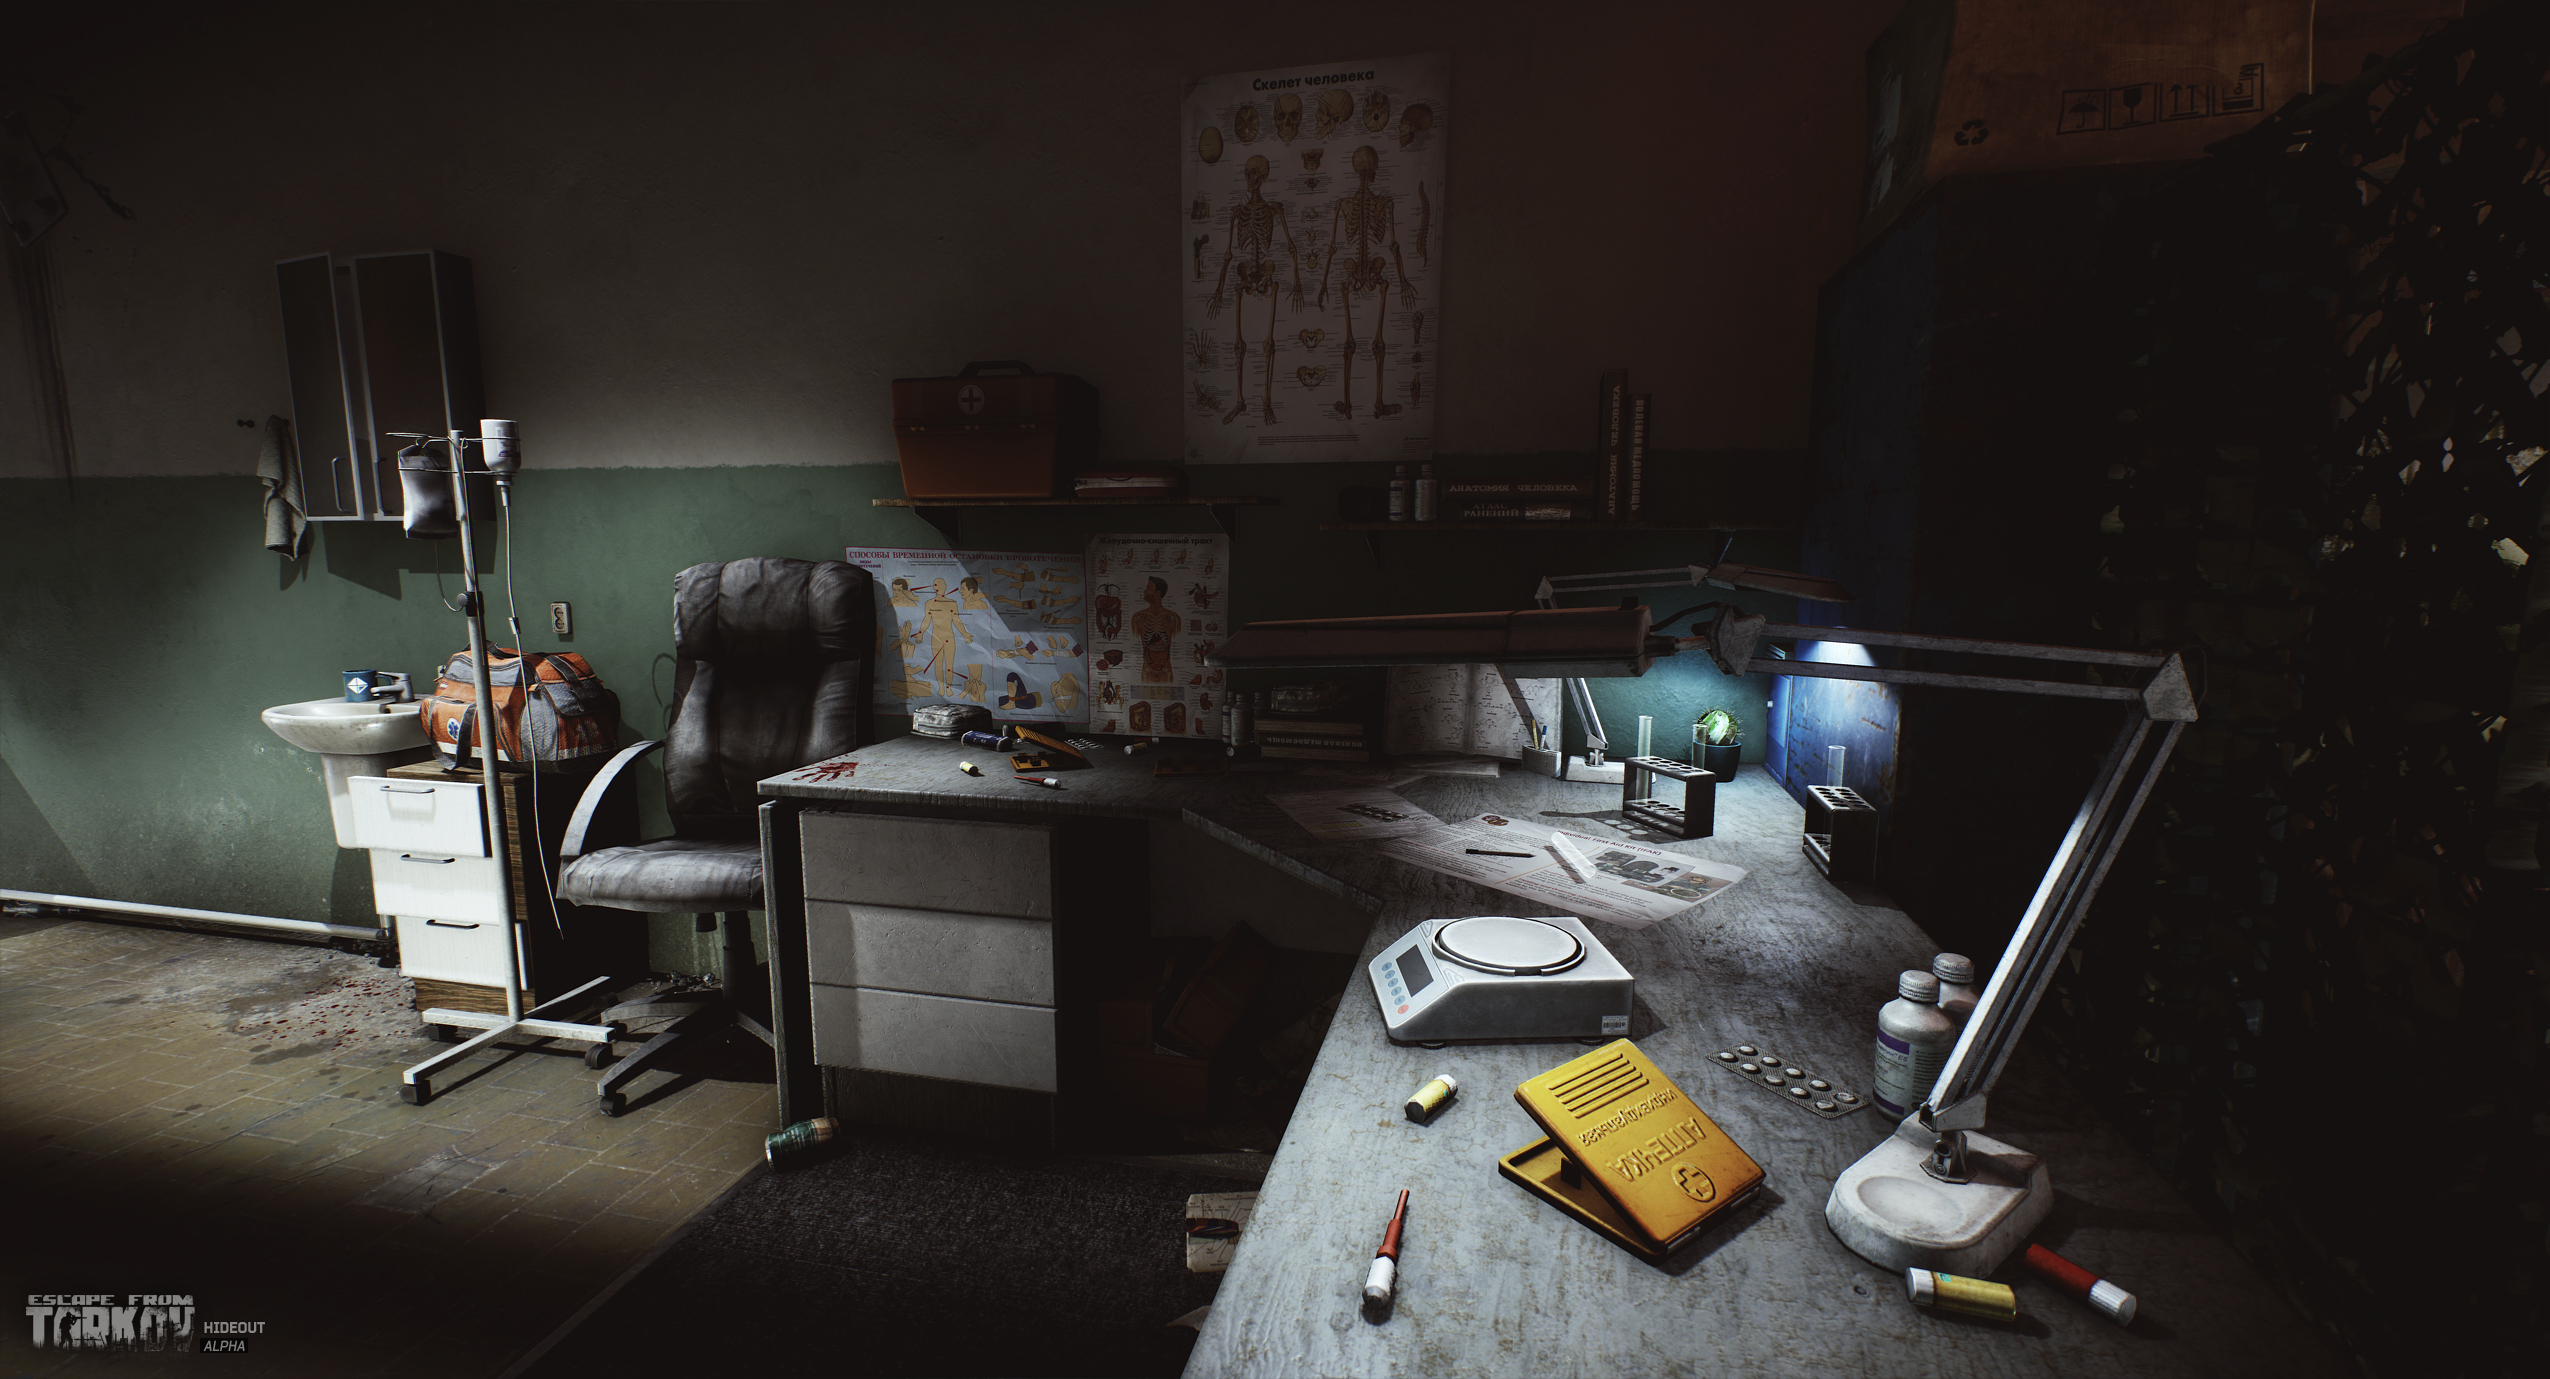 escapefromtarkov_hideout10.jpg